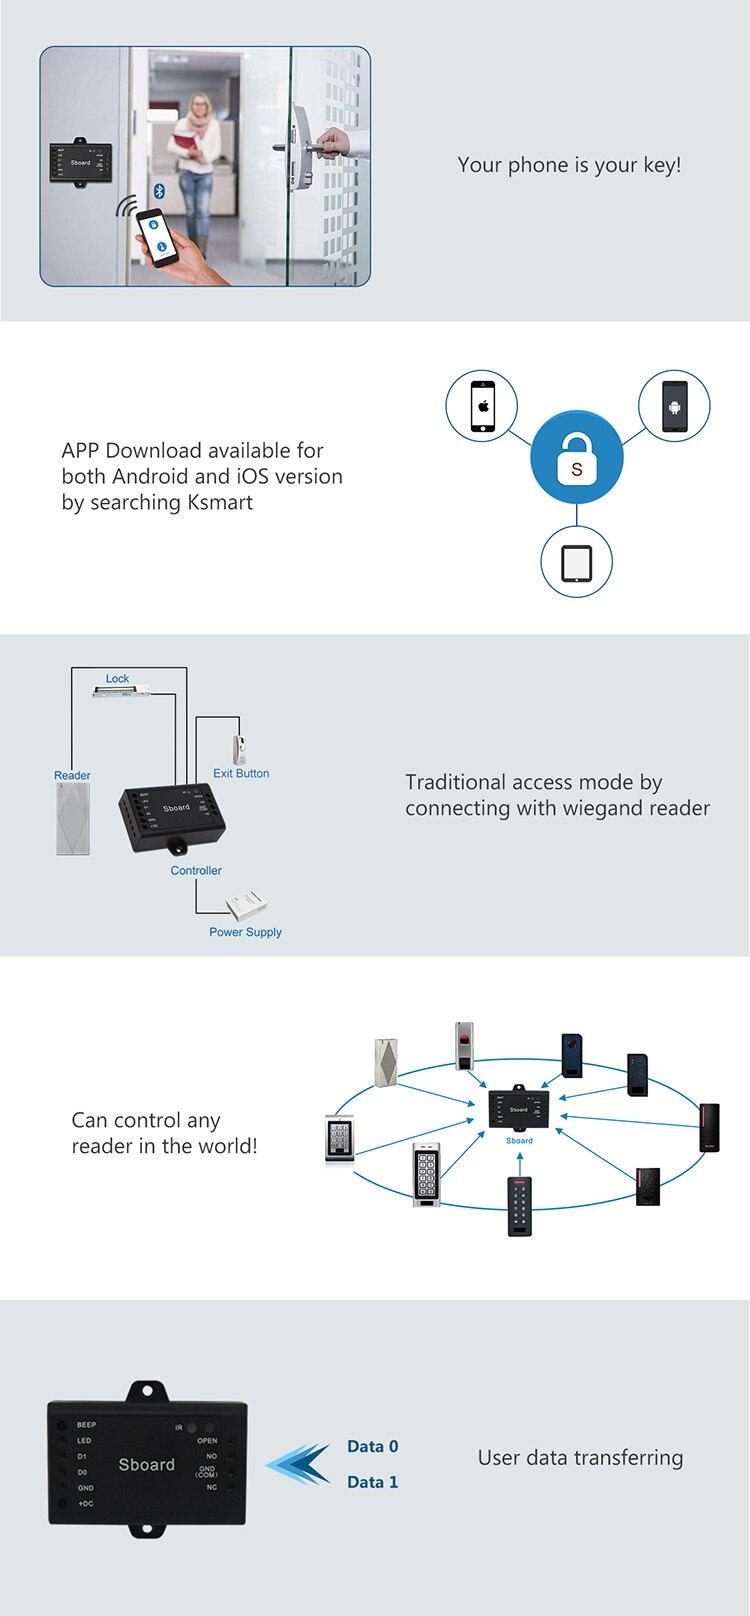 Sboard-BT Bluetooth Access Control